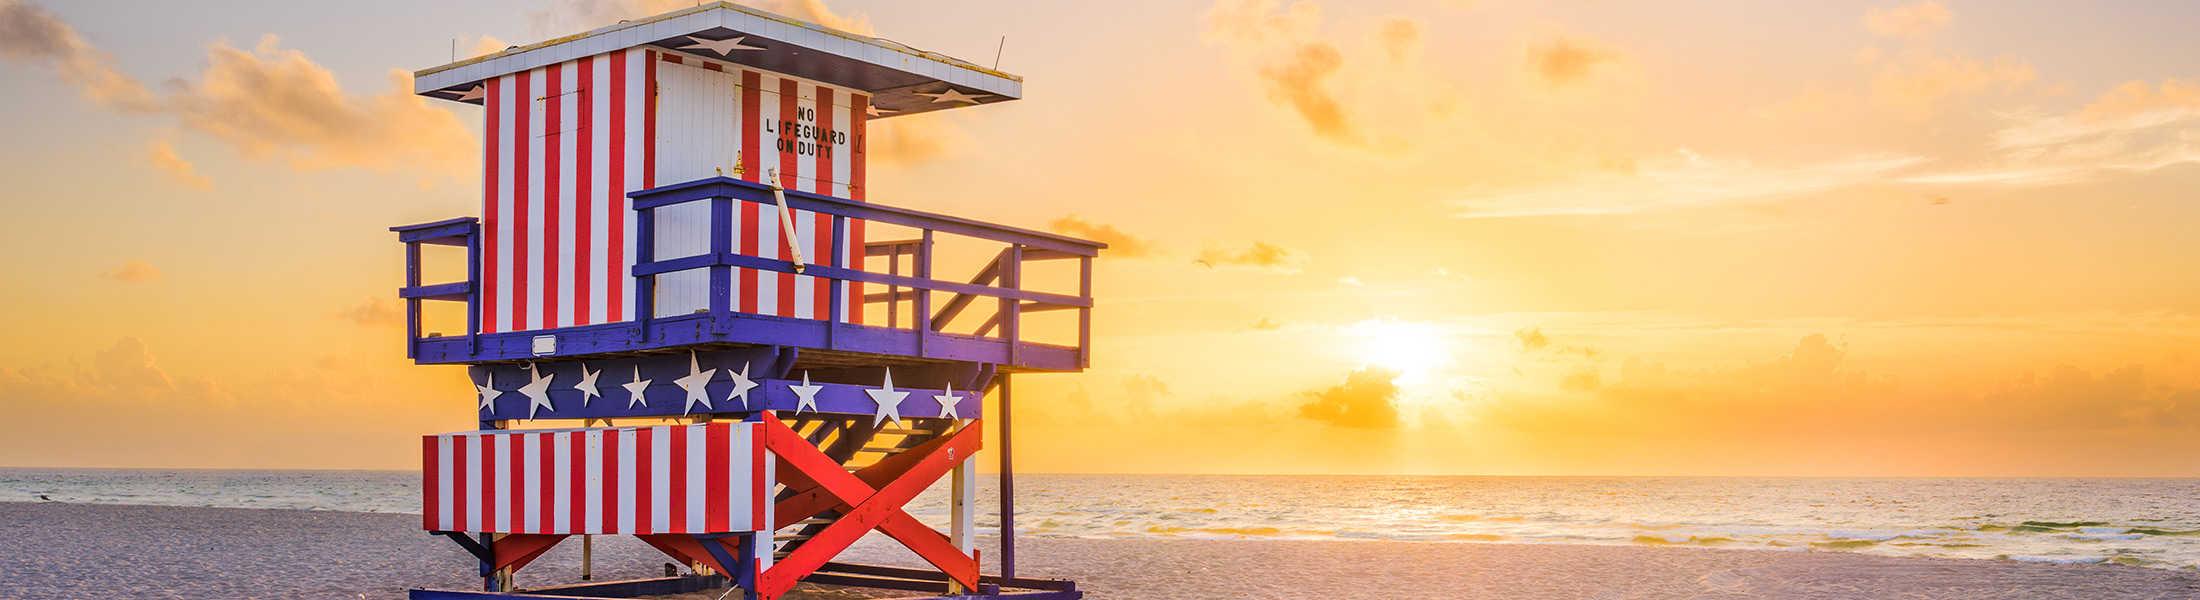 Lifeguard hut on Miami Beach at sunrise on a USA & Caribbean multi-centre